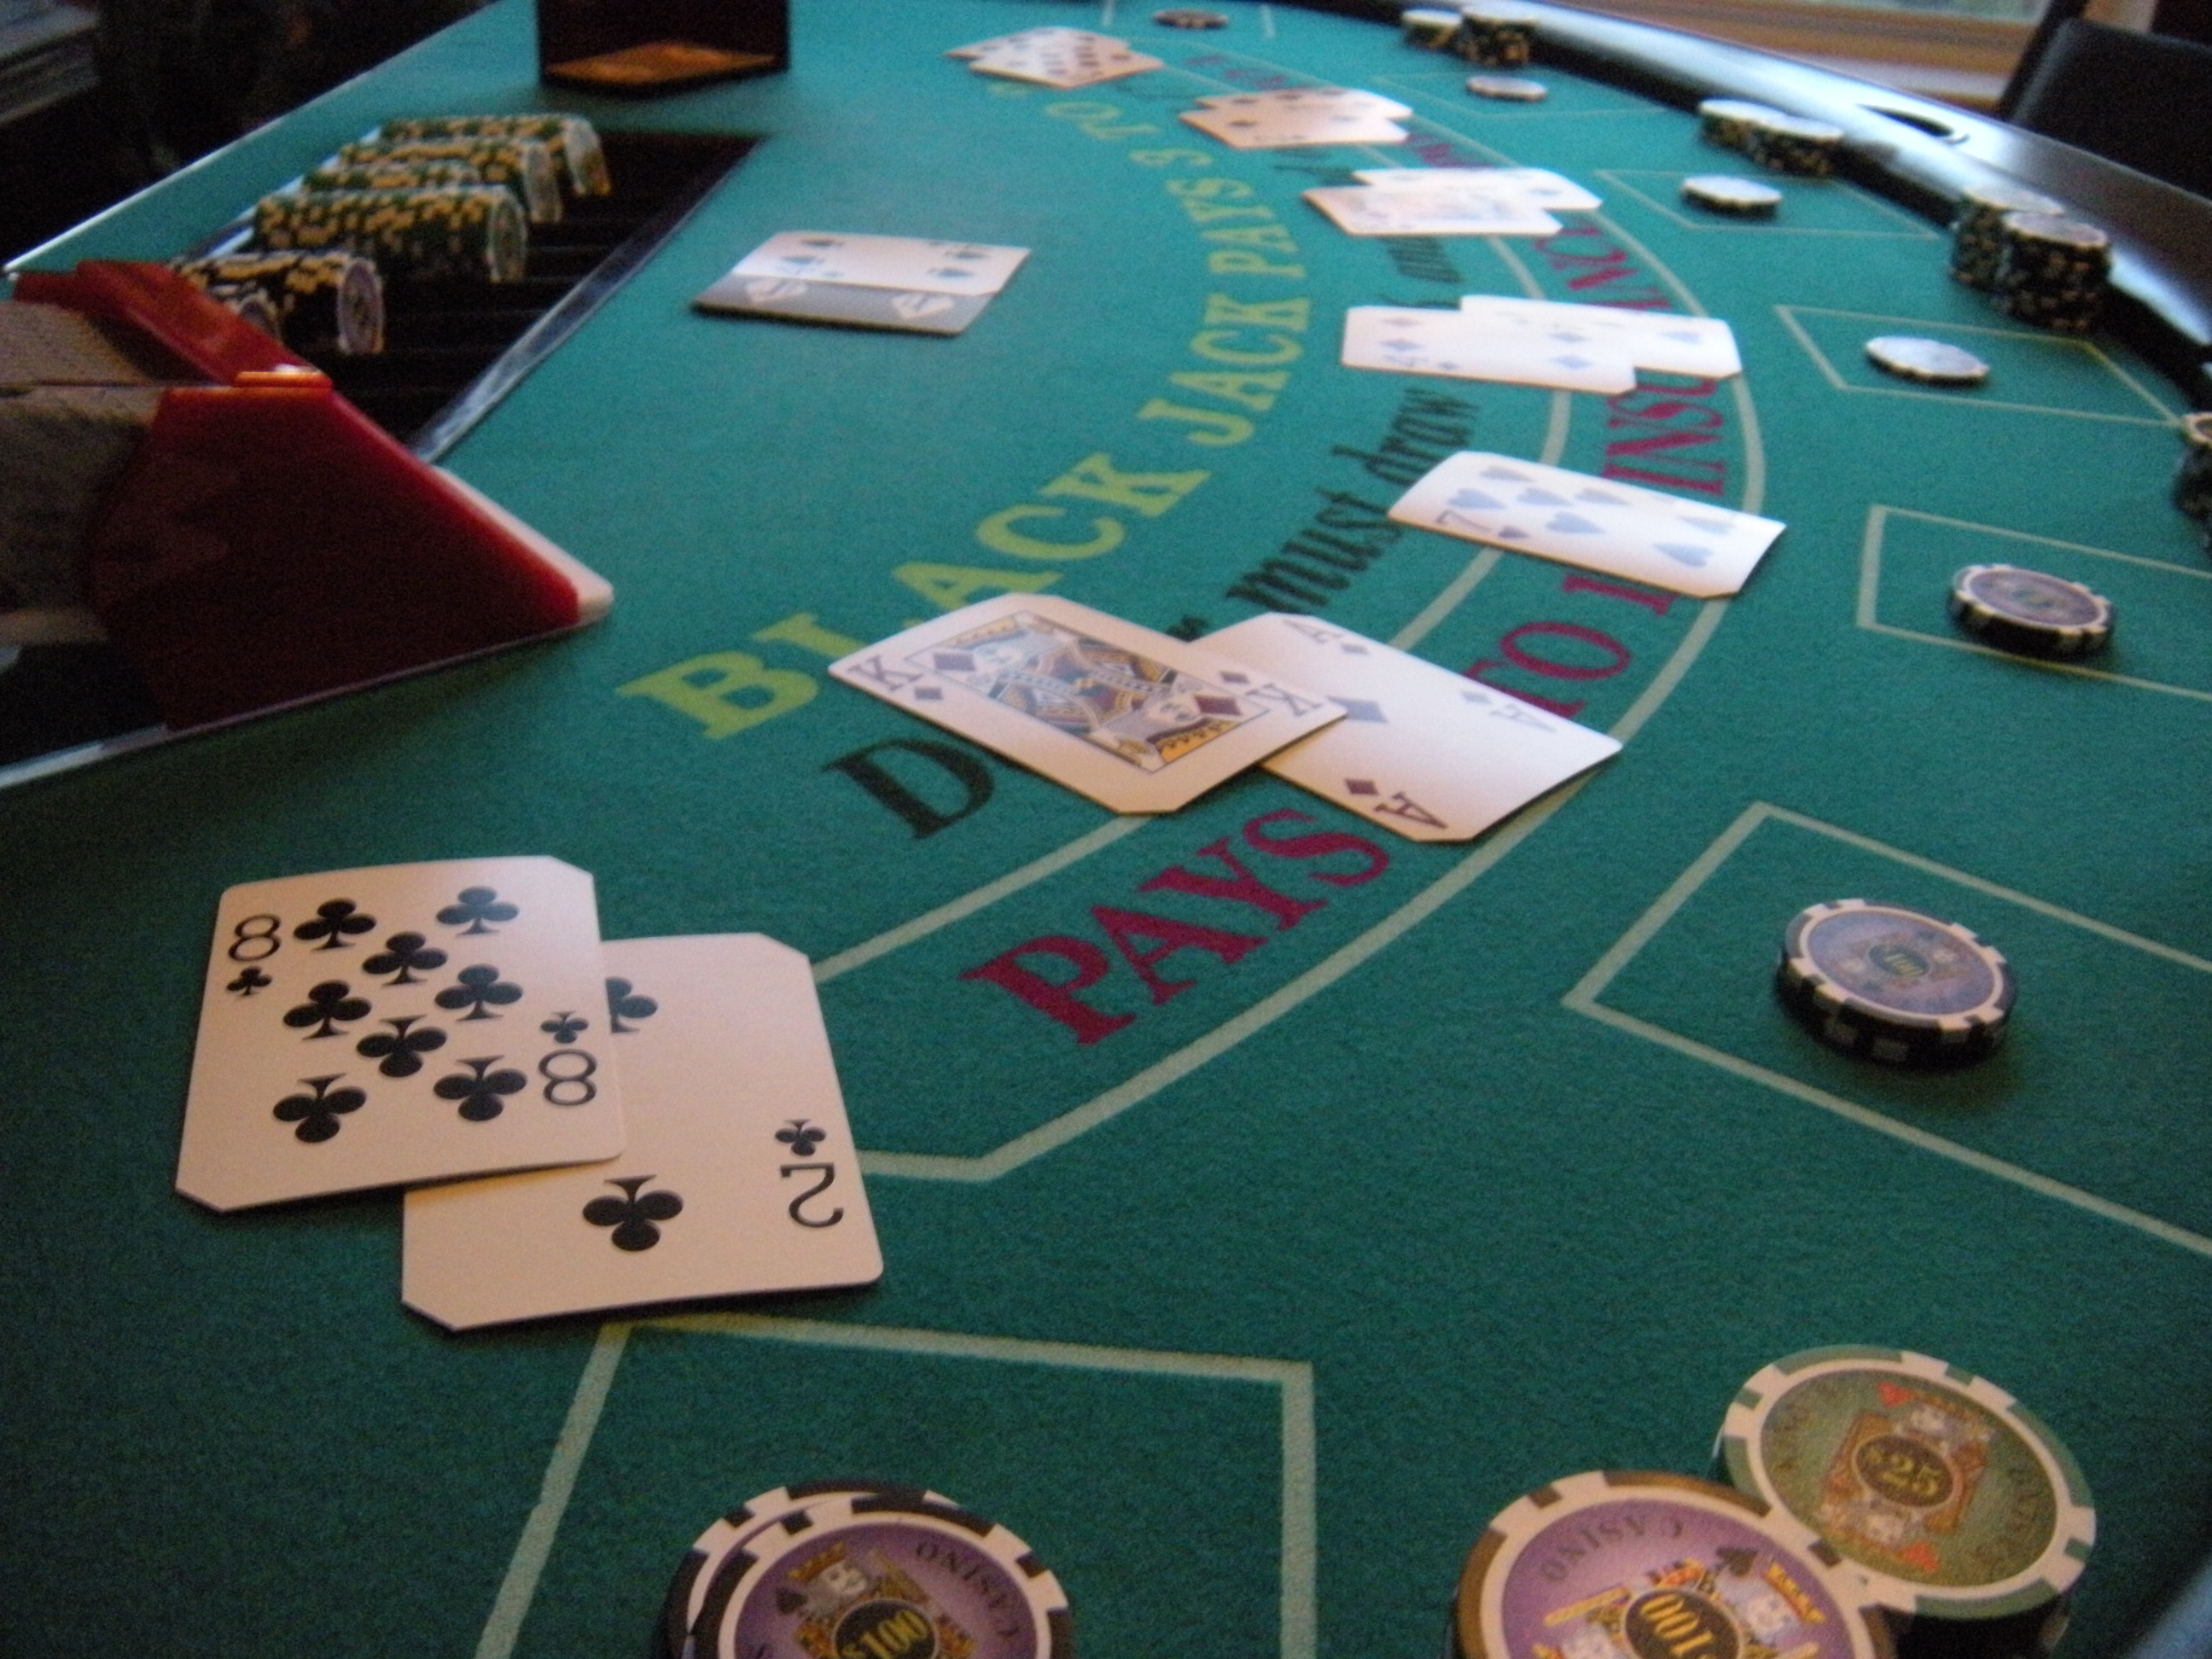 Casino Night  Fundraiser  Bingo  Poker  Blackjack